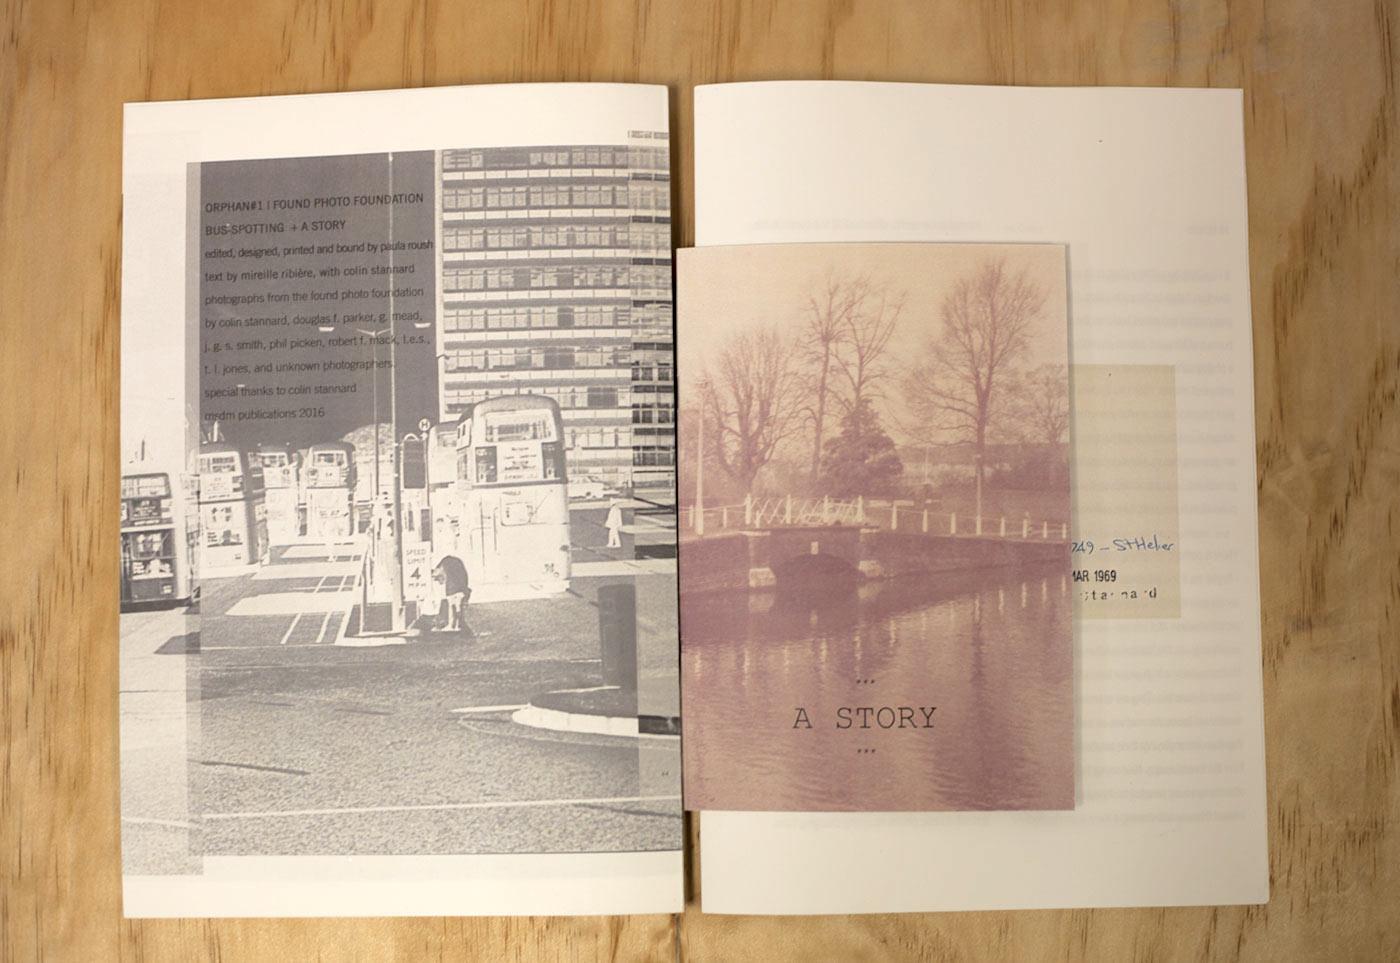 paula-roush-bus-spotting-photobook-msdm-publications-orphan1-152